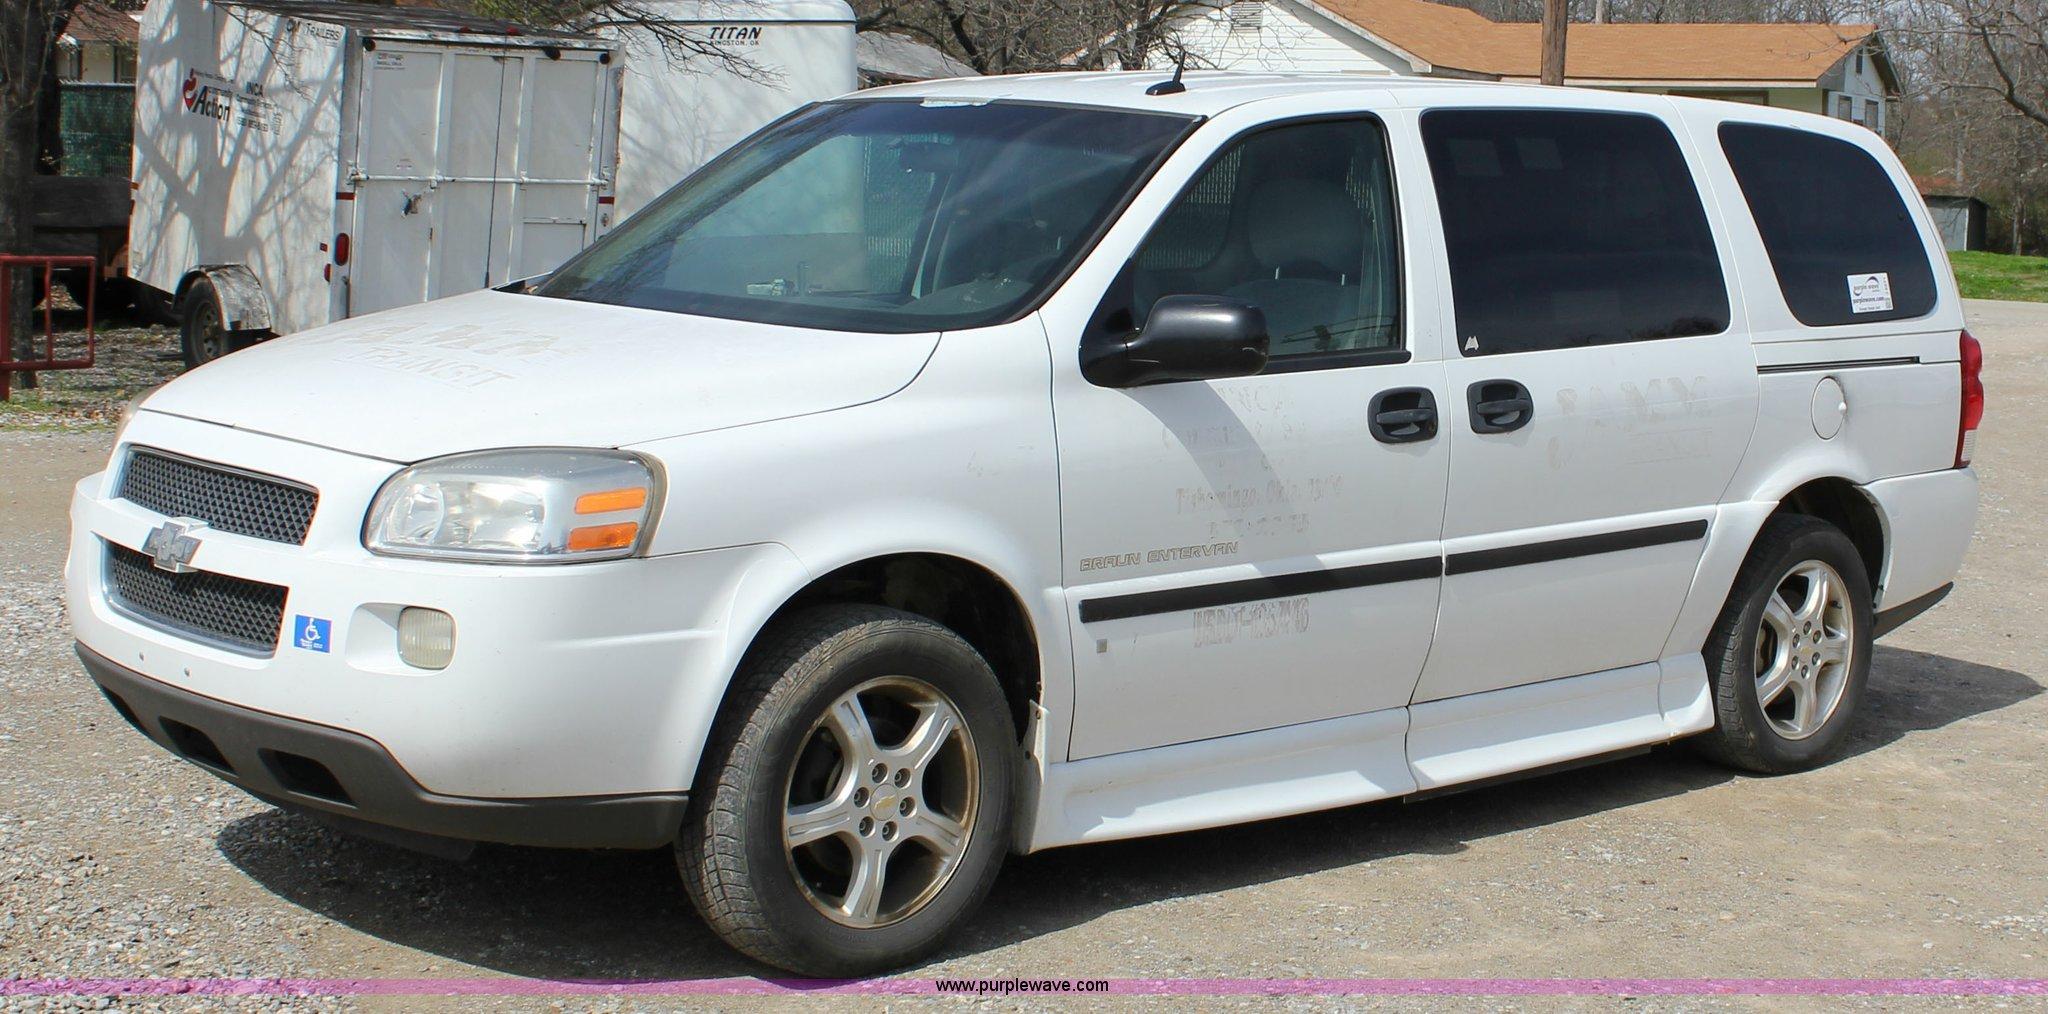 2007 Chevrolet Uplander Cargo Van Item J2271 Sold April Gmc Savana Image For